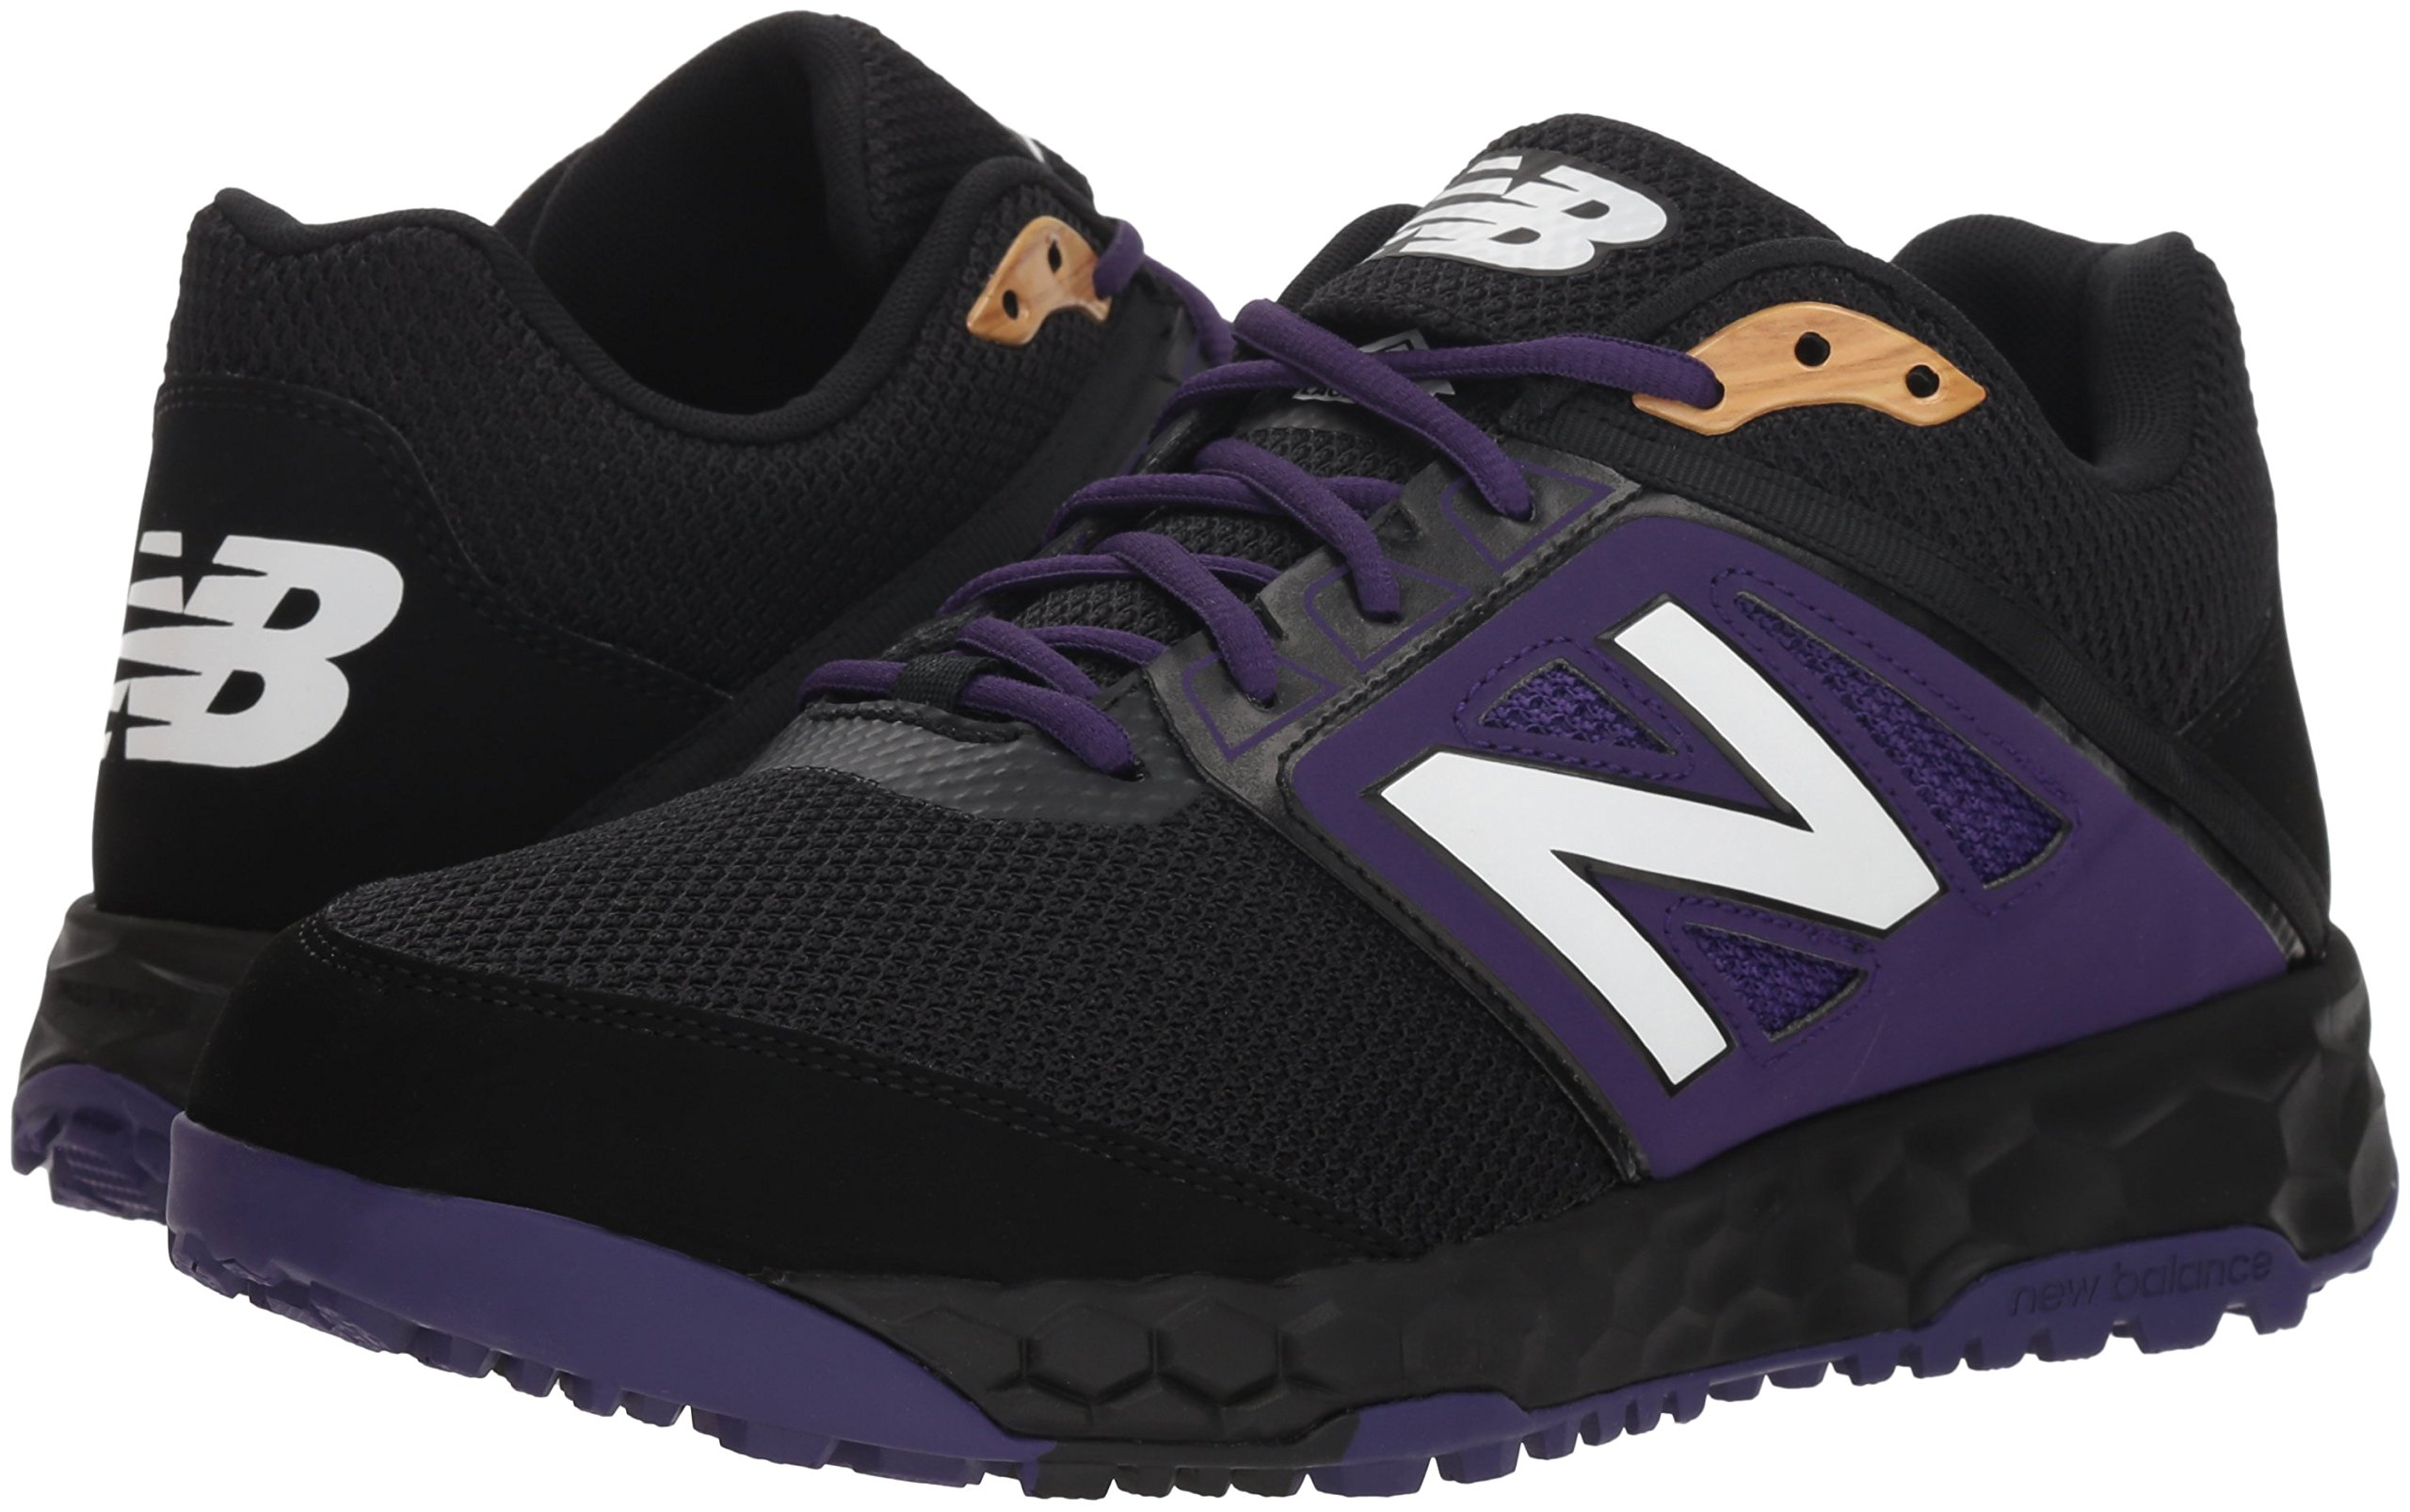 New Balance Men's 3000v4 Turf Baseball Shoe, Black/Purple, 5 D US by New Balance (Image #5)